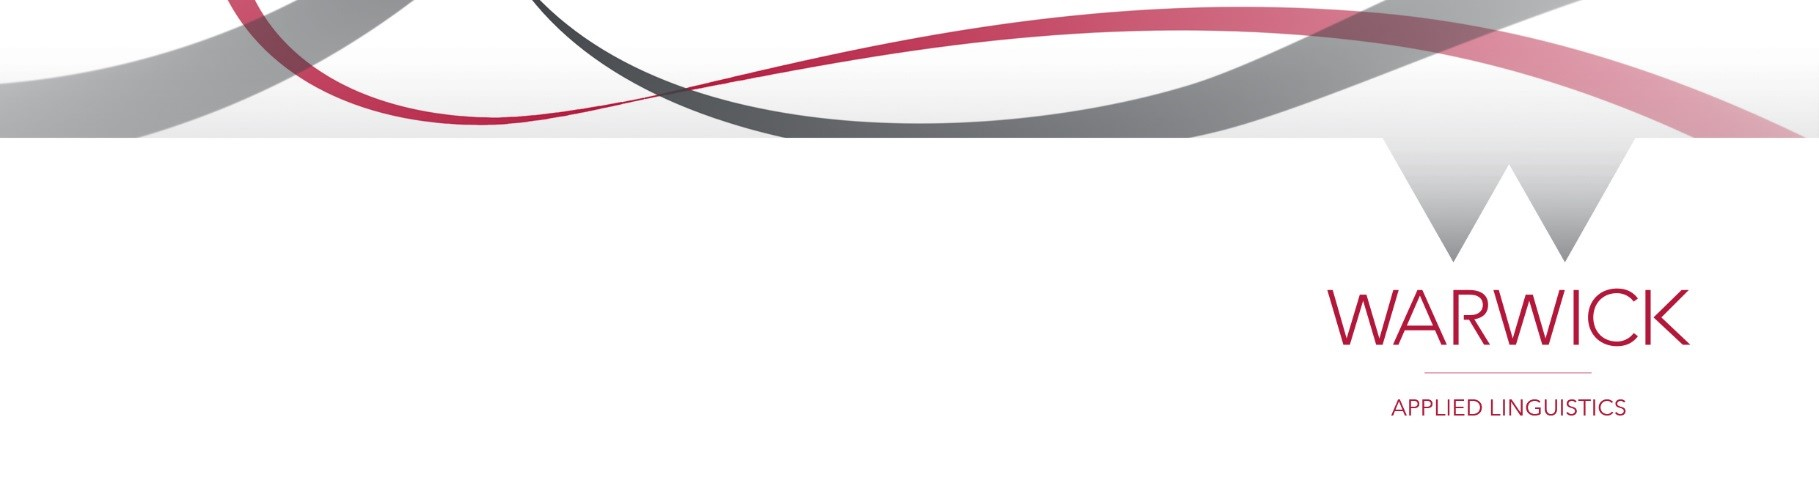 Warwick brand logo v3